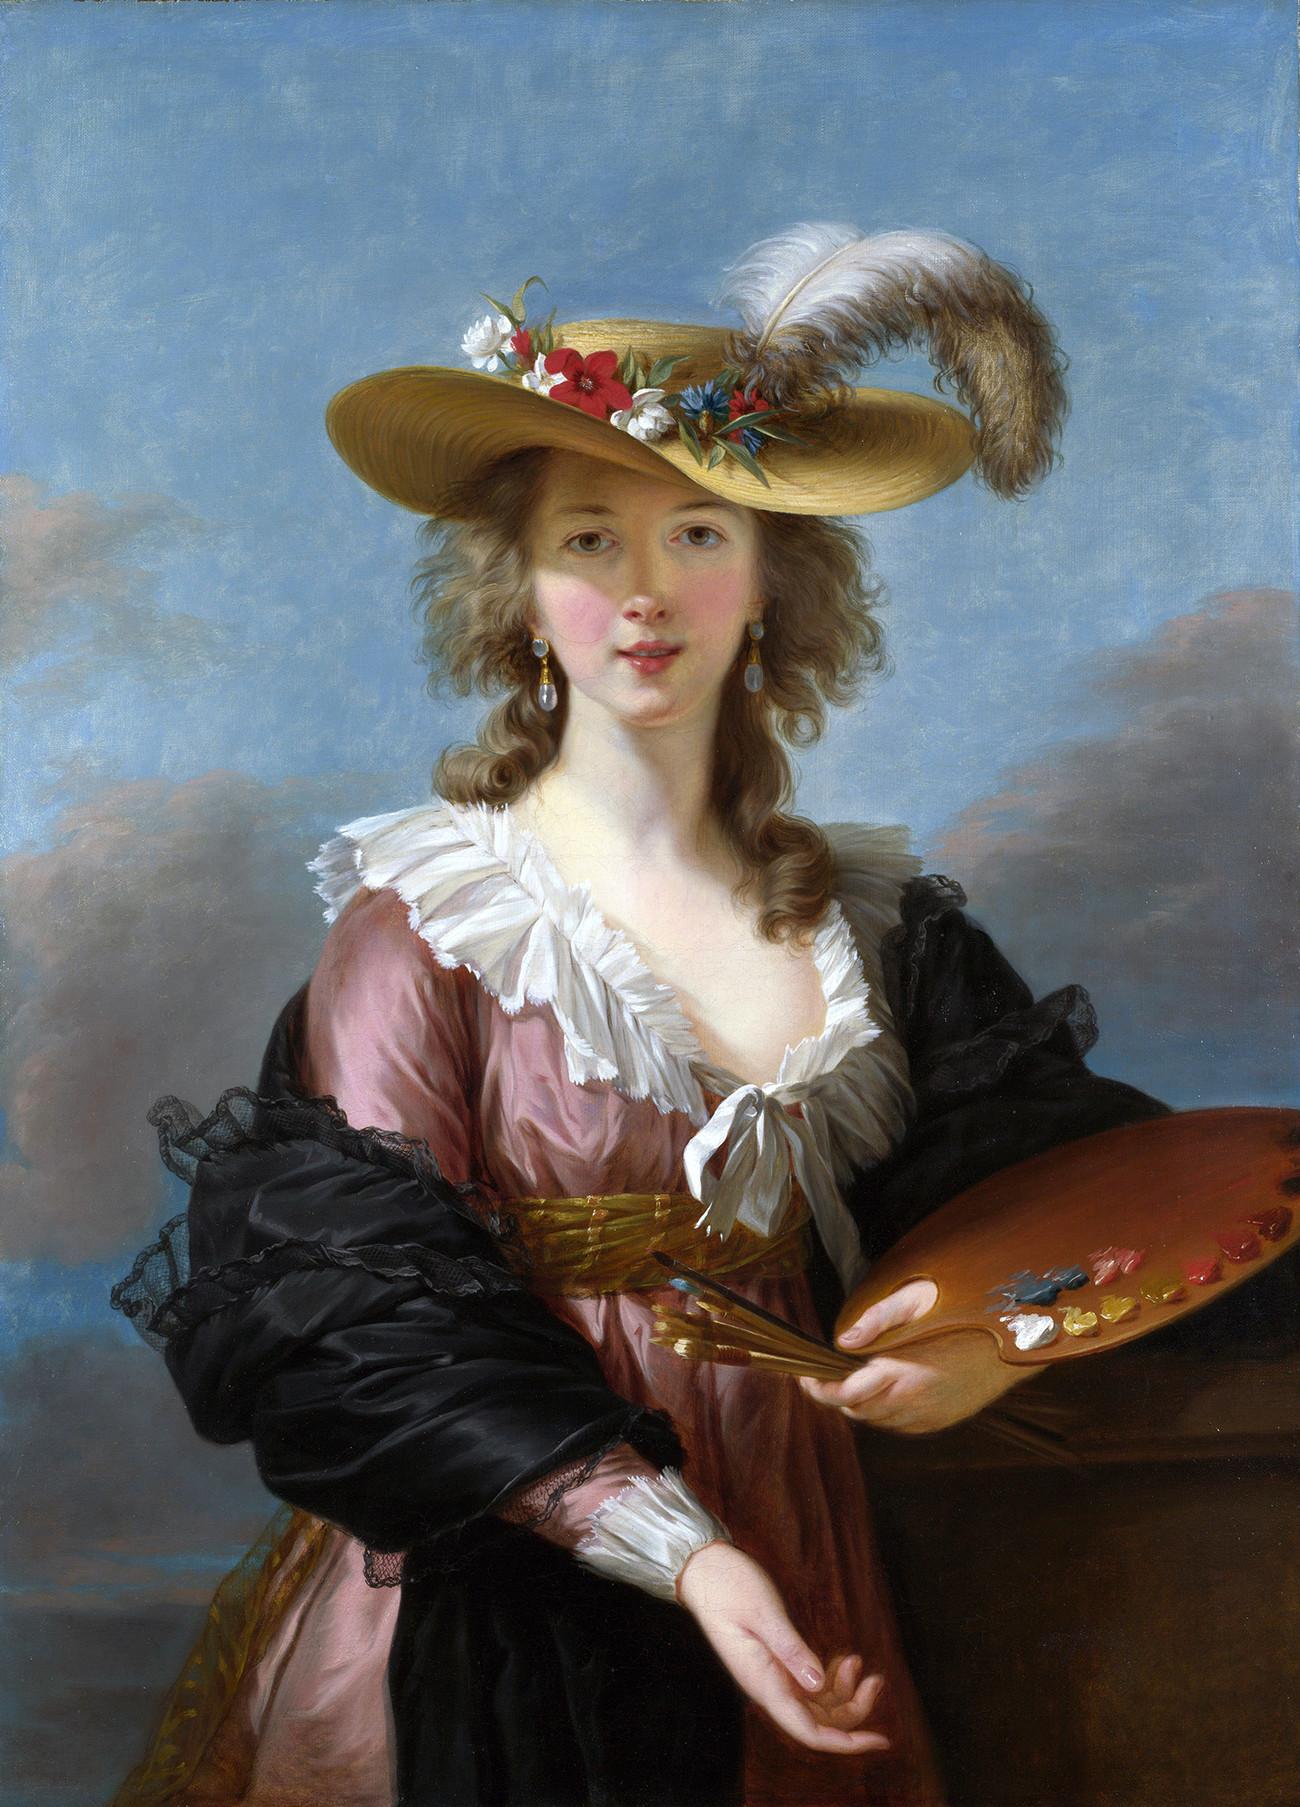 Elizabeth Vigée-Lebrun. Potret diri dengan Topi Jerami.